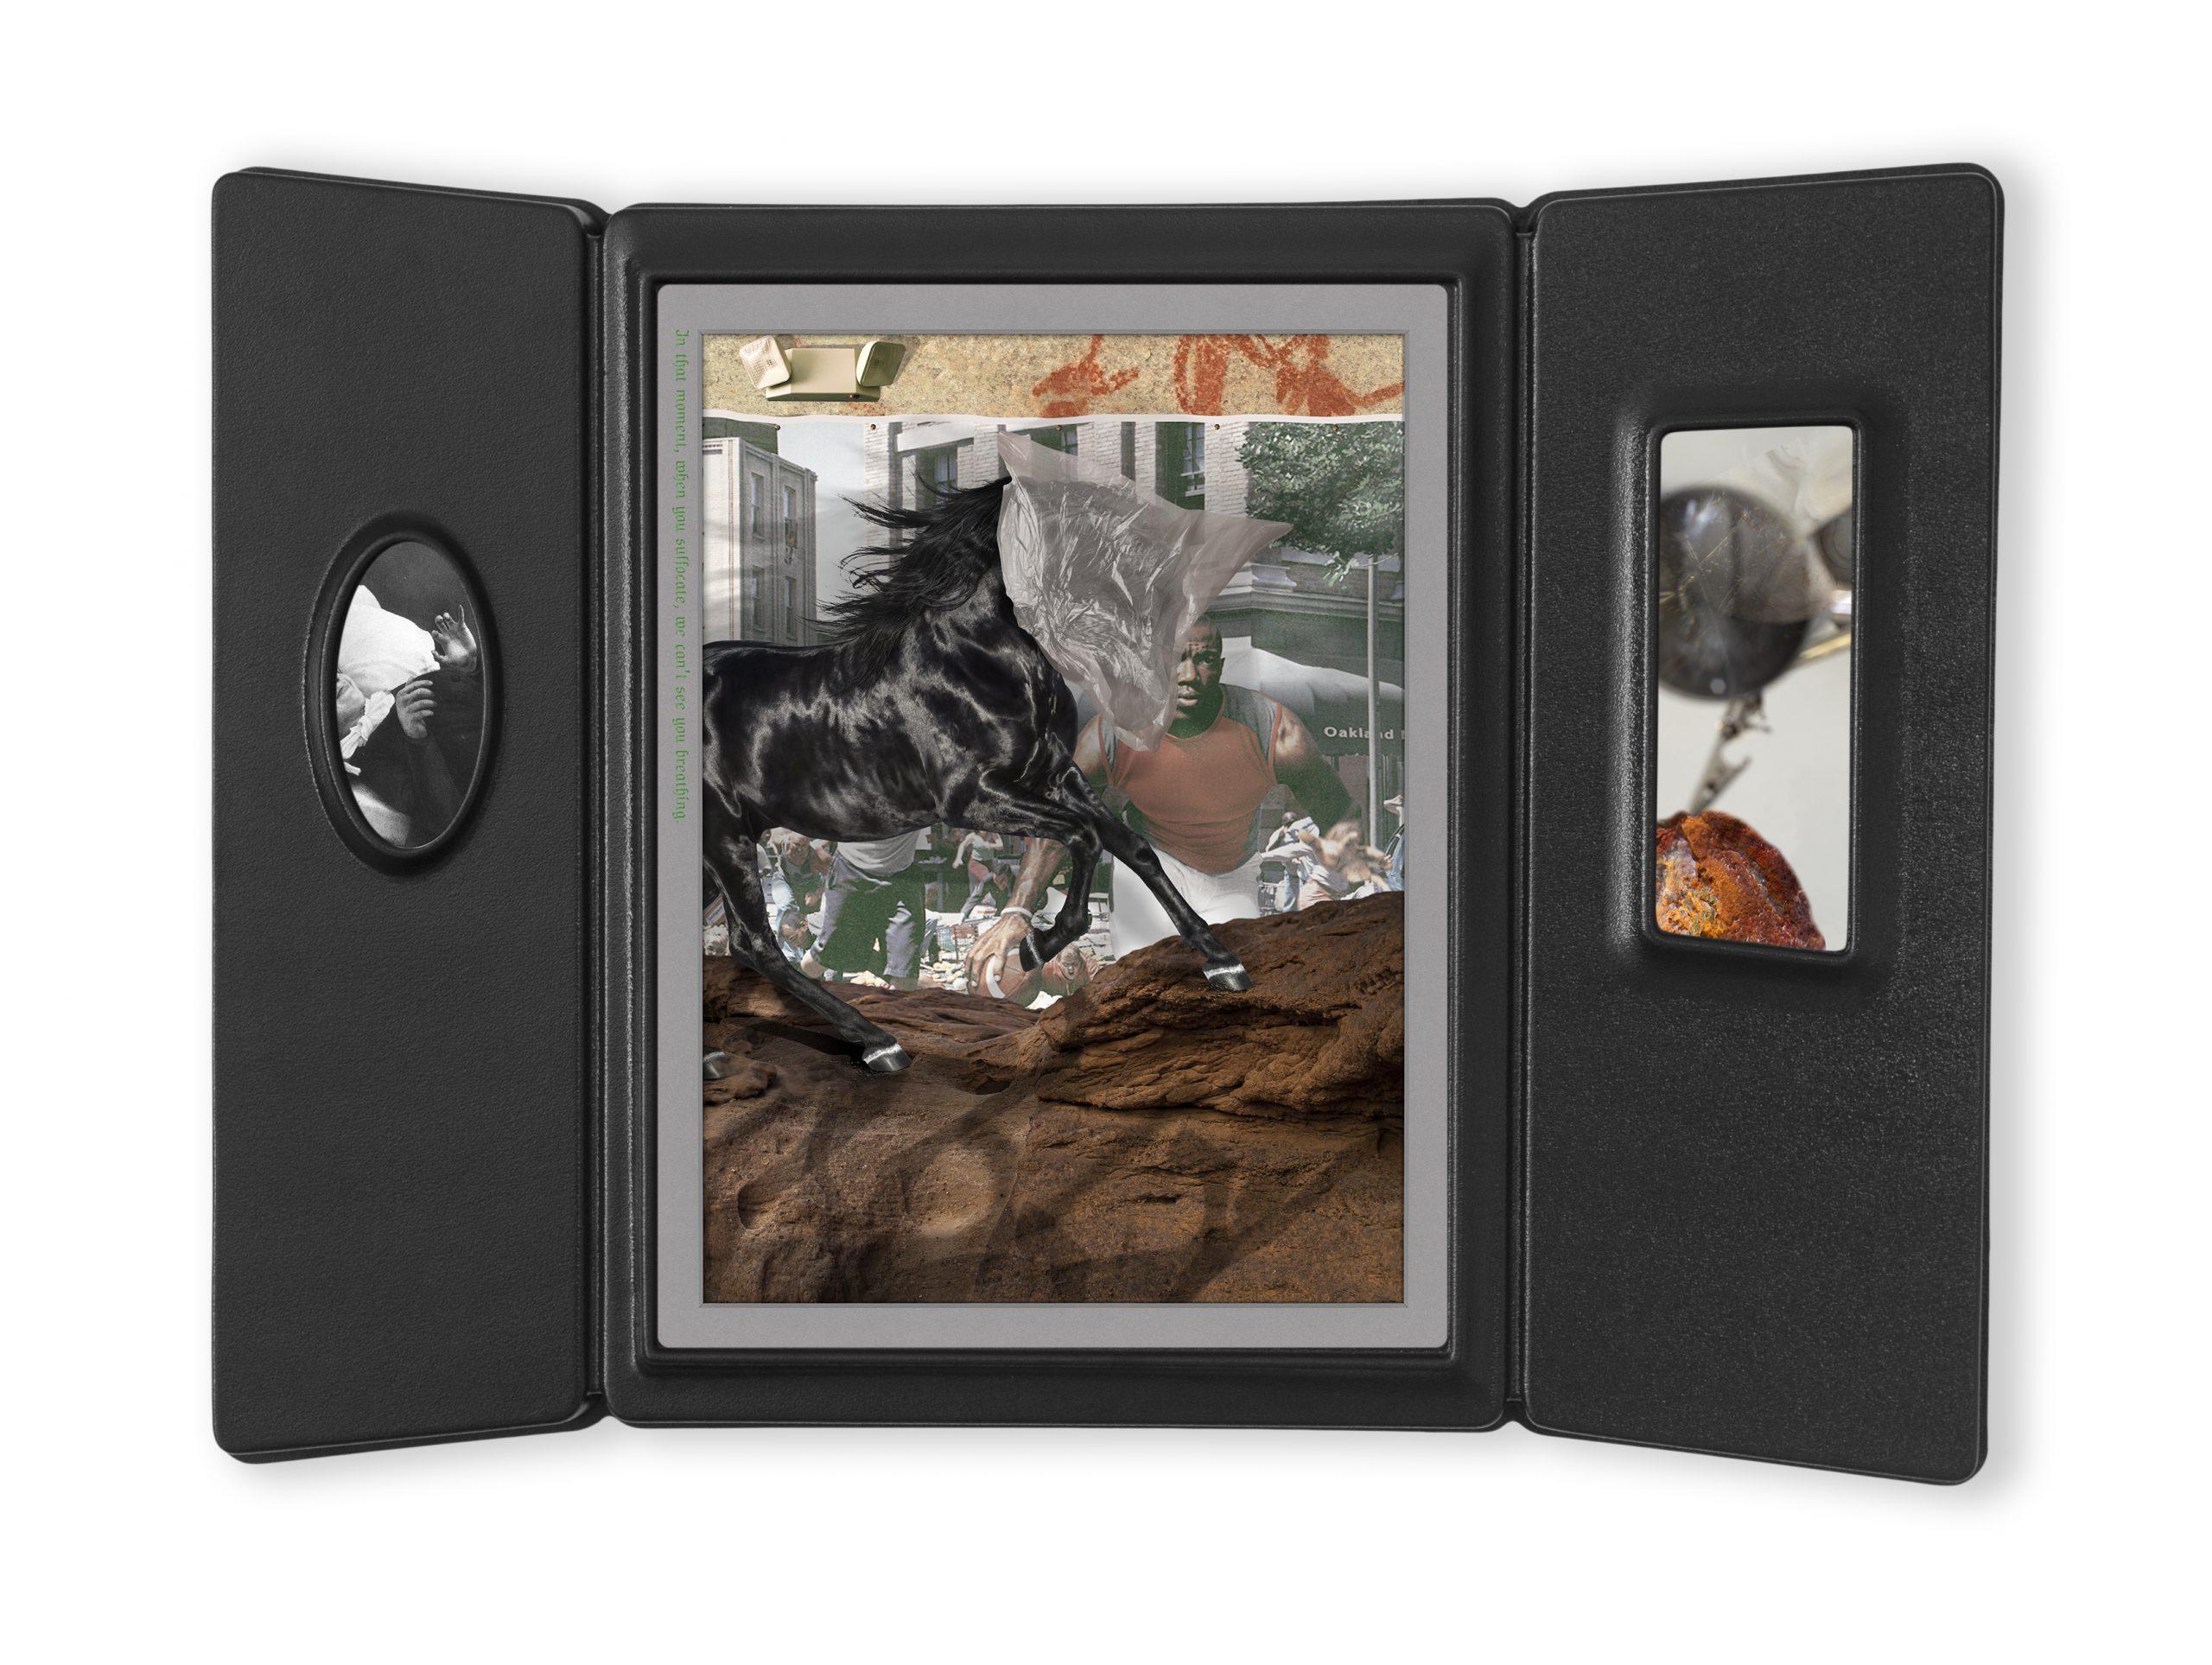 Eleonore (case 4008), inkjet prints, acrylic face mount, vacuum formed frame, 51.5x70x5 cm